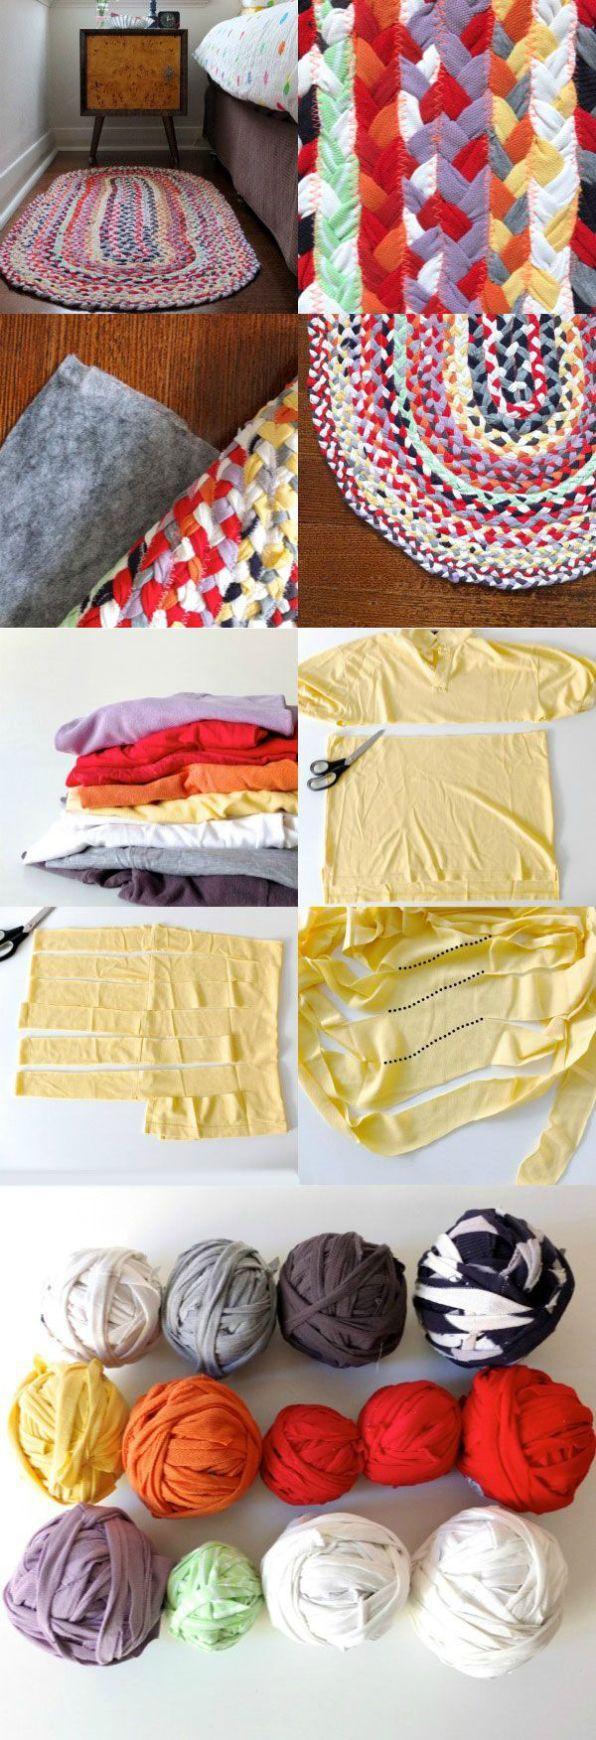 Diy Old Tshirts Tugs House Stuff Pinterest Crochet